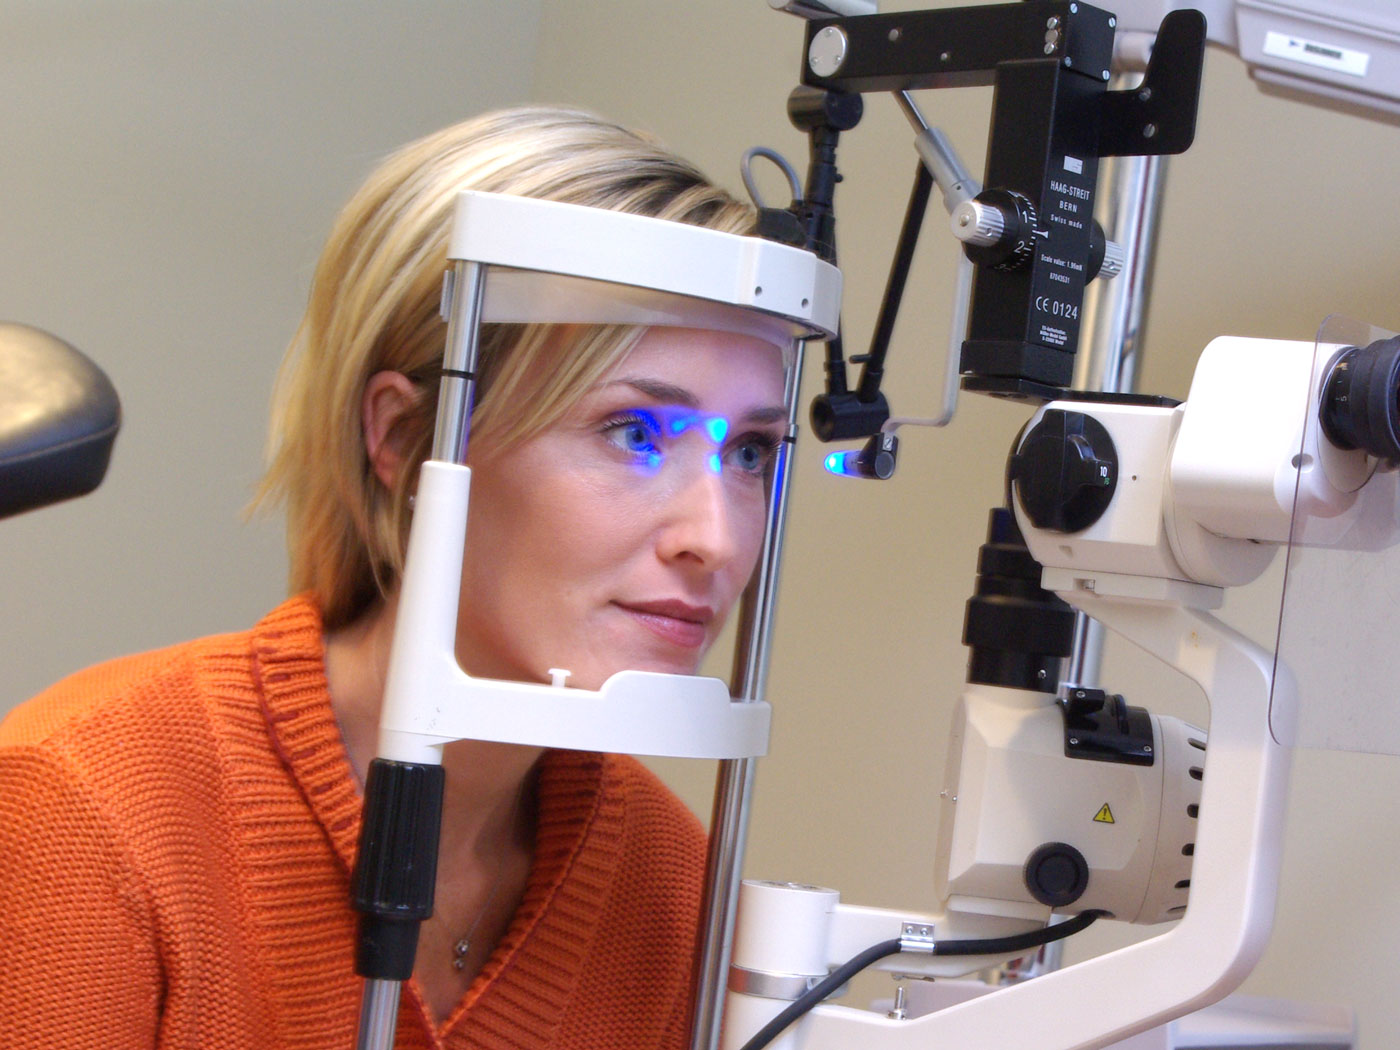 Medical Eyecare-volunteer-eyecare-local-eye-doctor-knoxville-tn-area-clinton, tn-maryville, tn-halls,tn-eyeglasses-contacts-designer-sunglasses